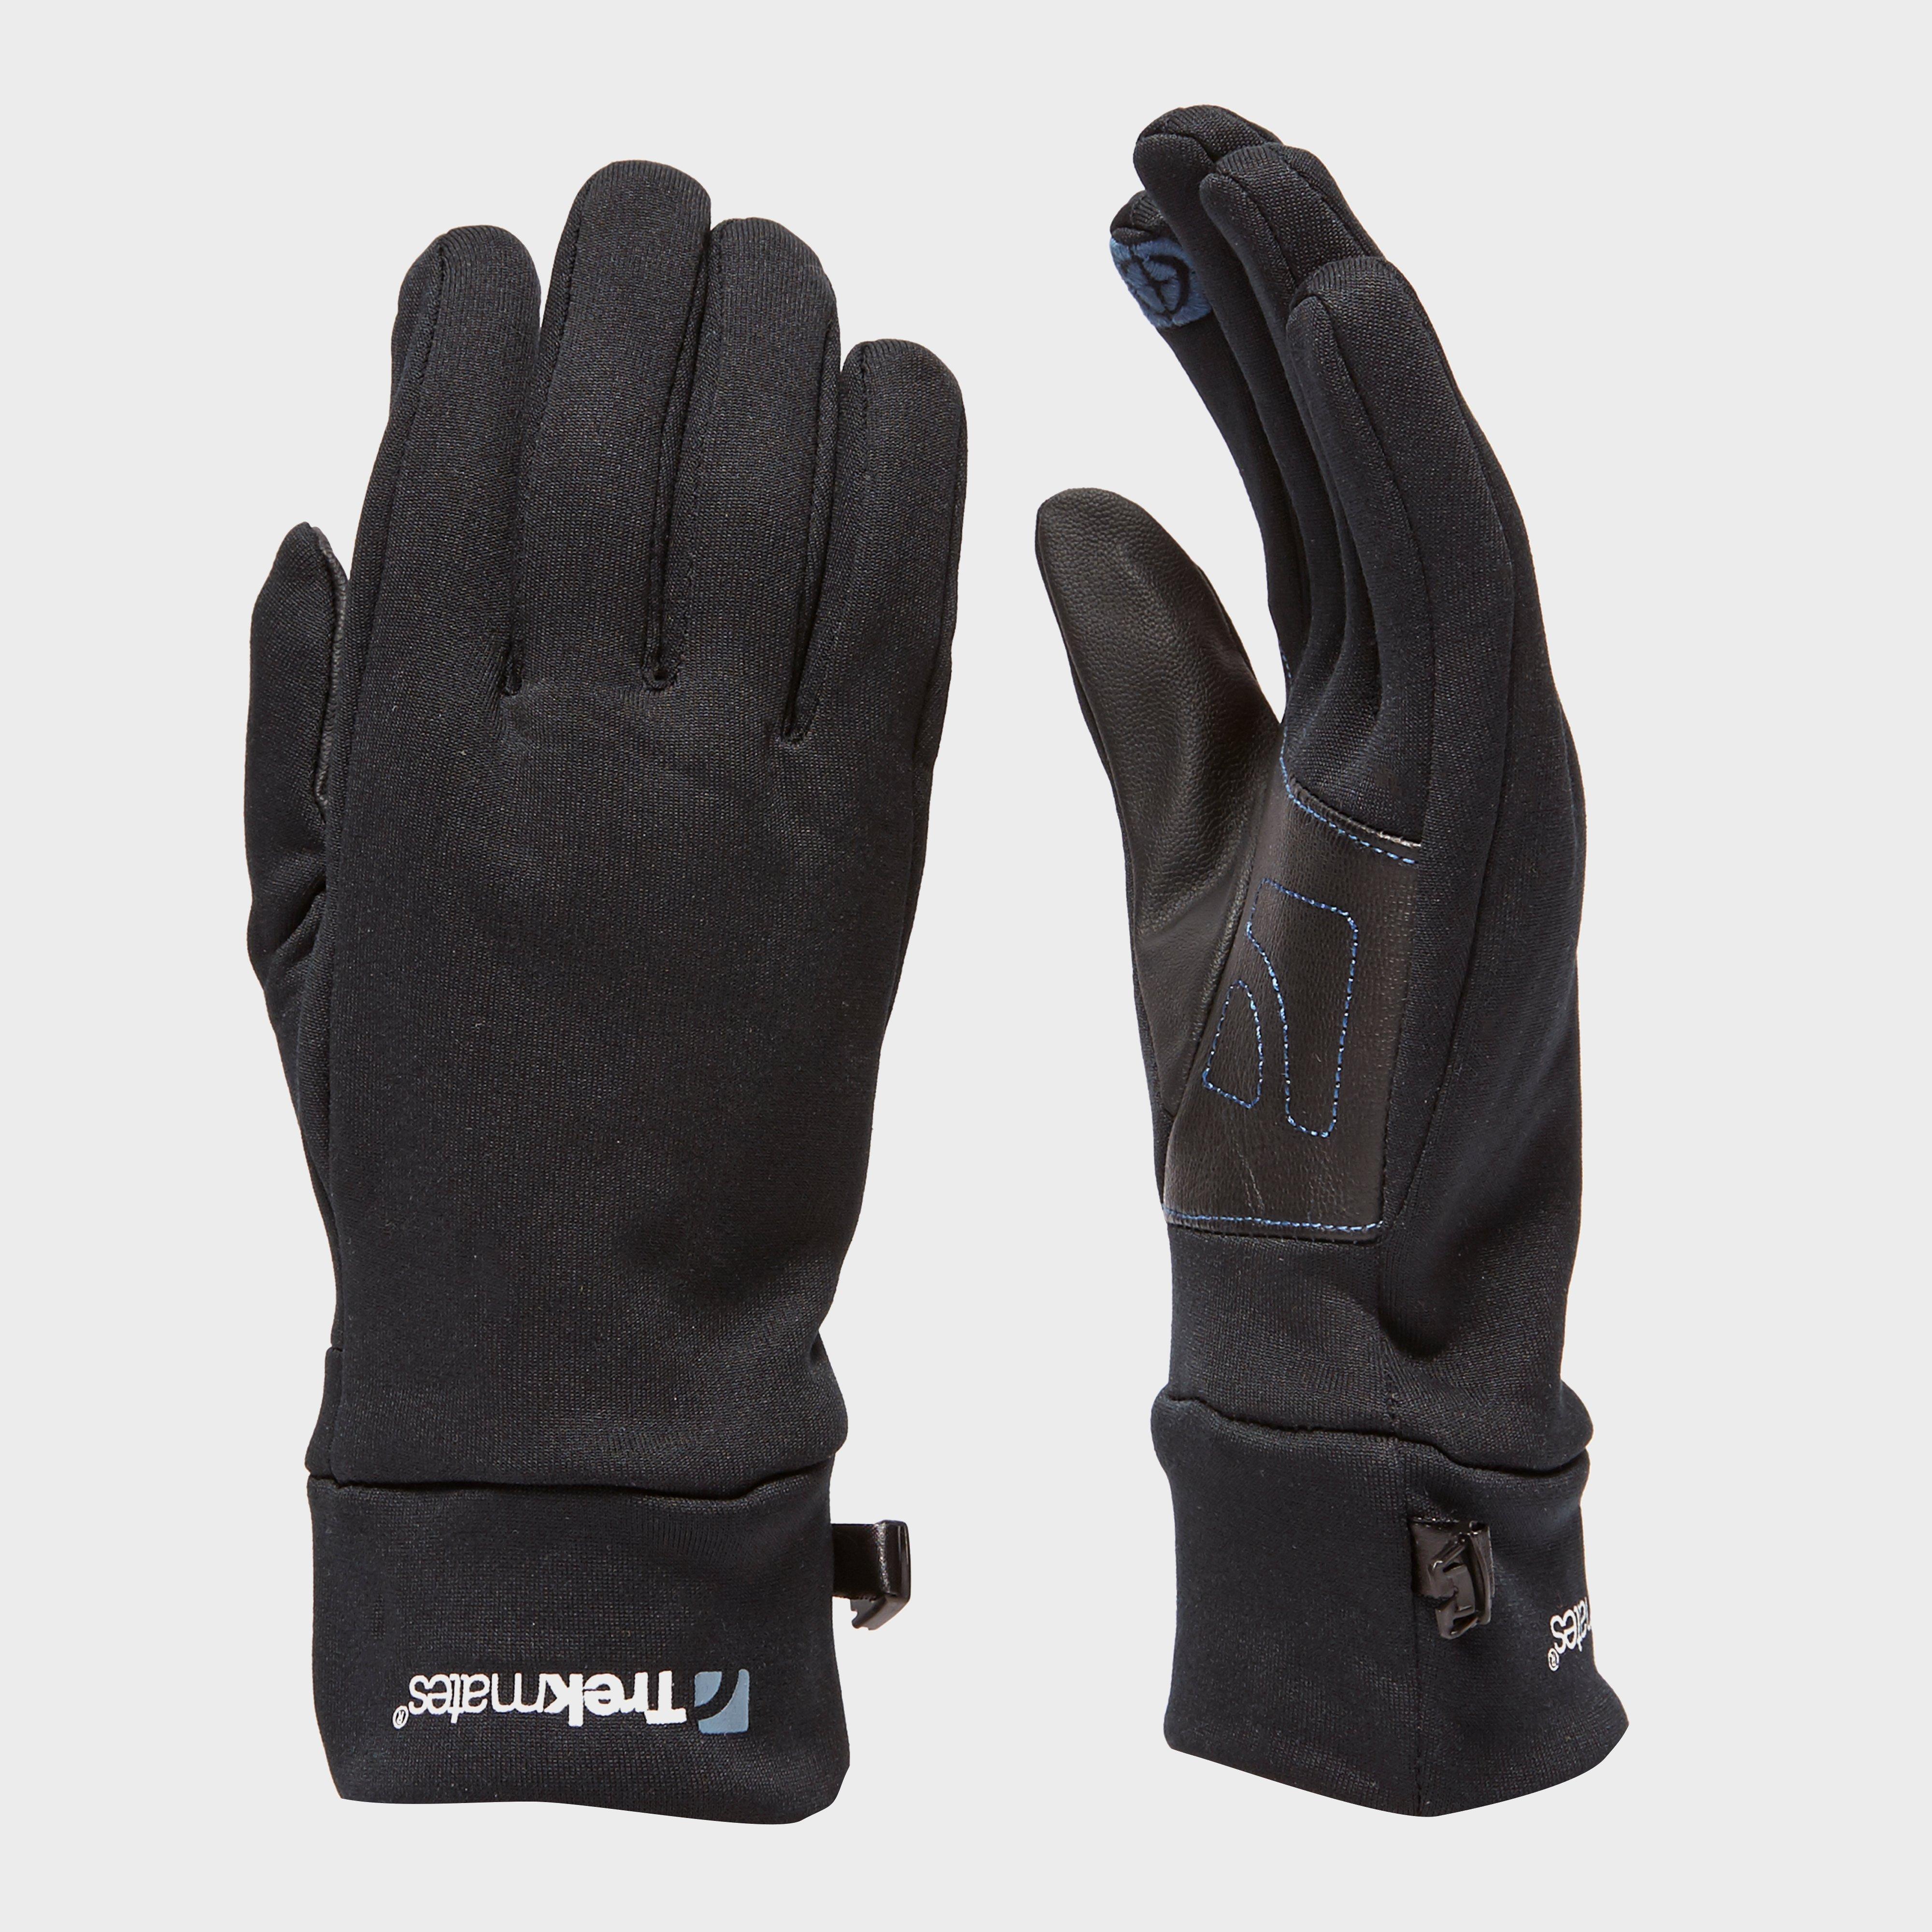 Trekmates Unisex Ullscarf Glove - Black, Black